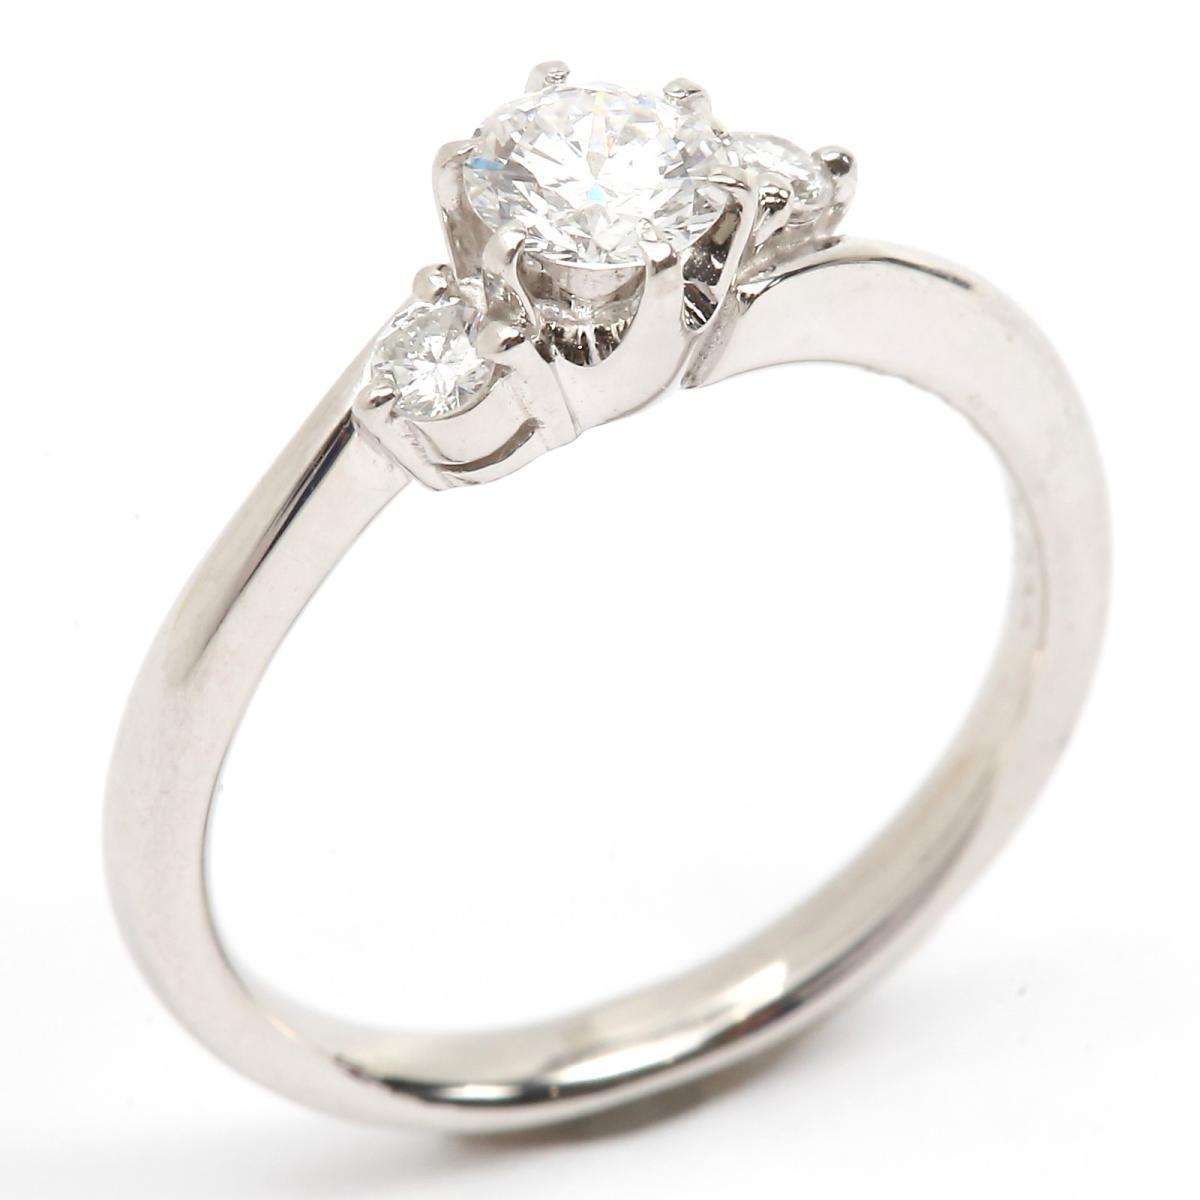 30fc9fc17d (Free shipping) Auth JEWELRY Diamond ring PT 900 Platinum x Diamond (0.303  cc/0.09ct) Used | BRANDOFF Ginza/TOKYO/Japan